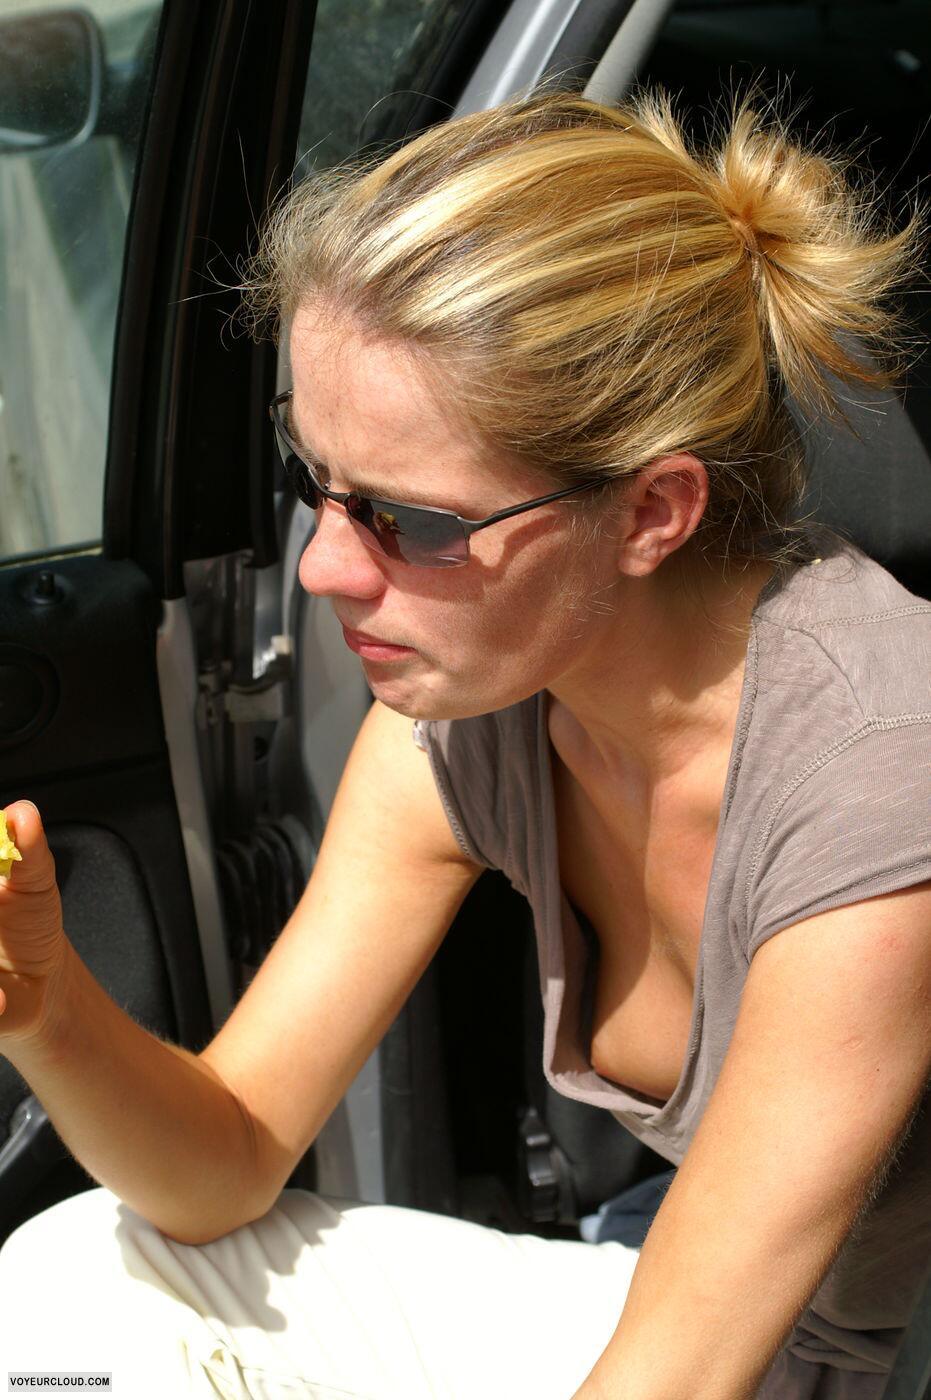 Wife nipple slip downblouse oops — photo 4